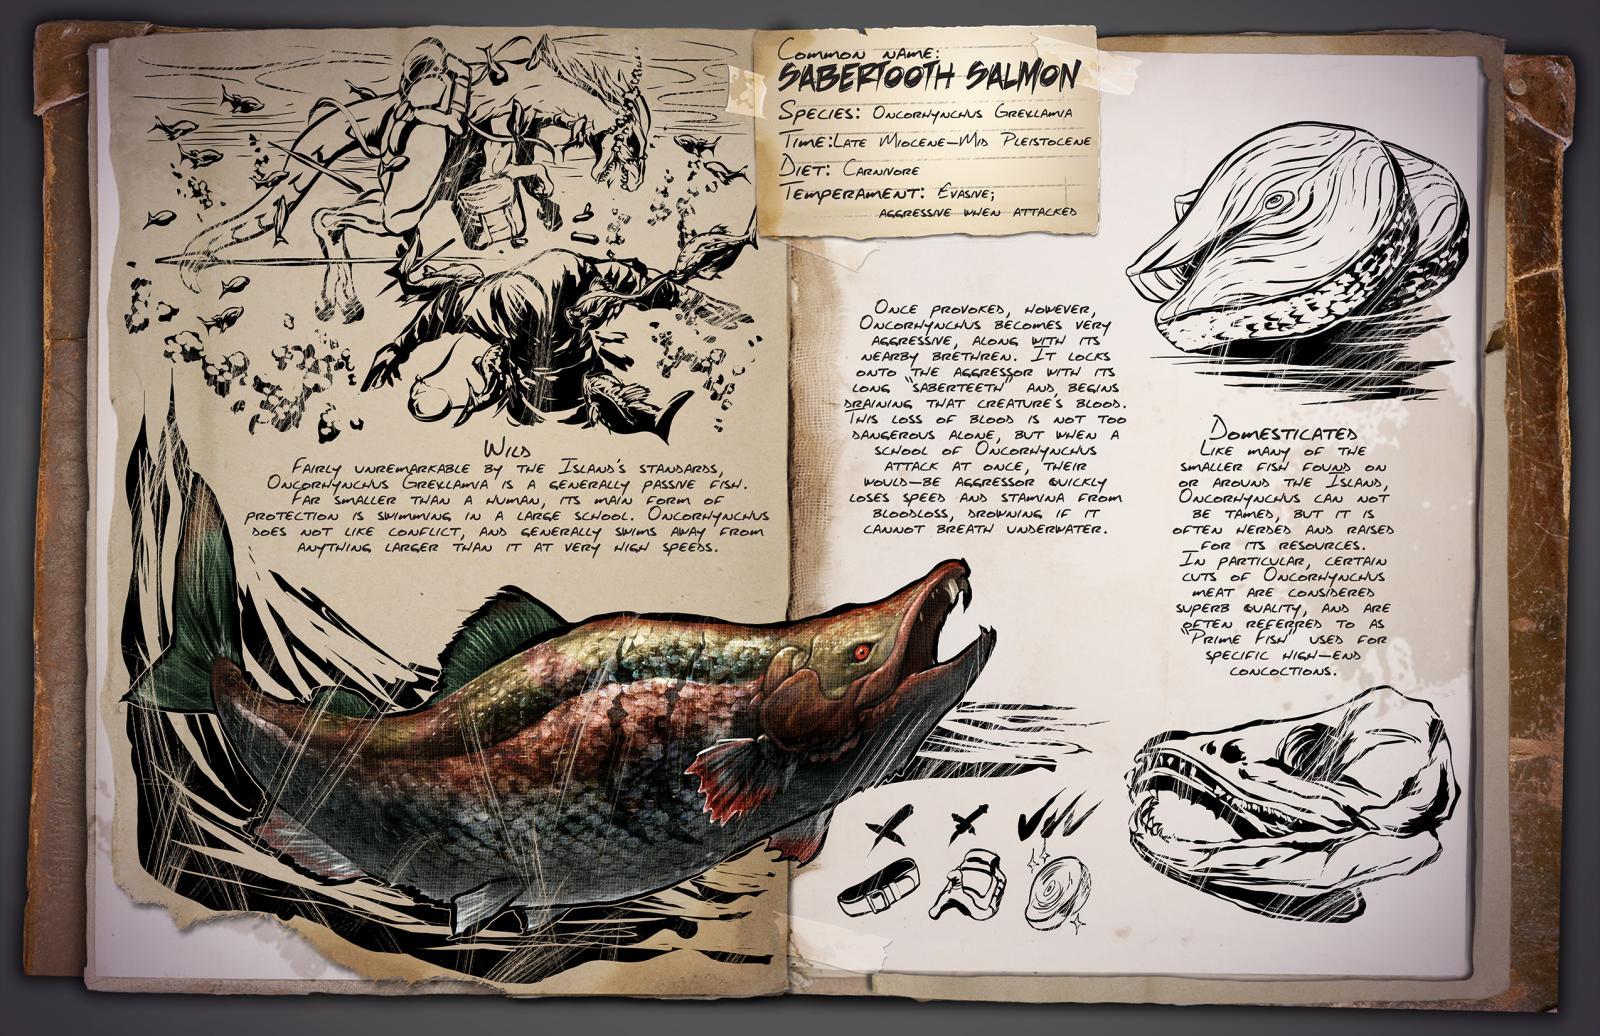 Dossier: Oncorhynchus!